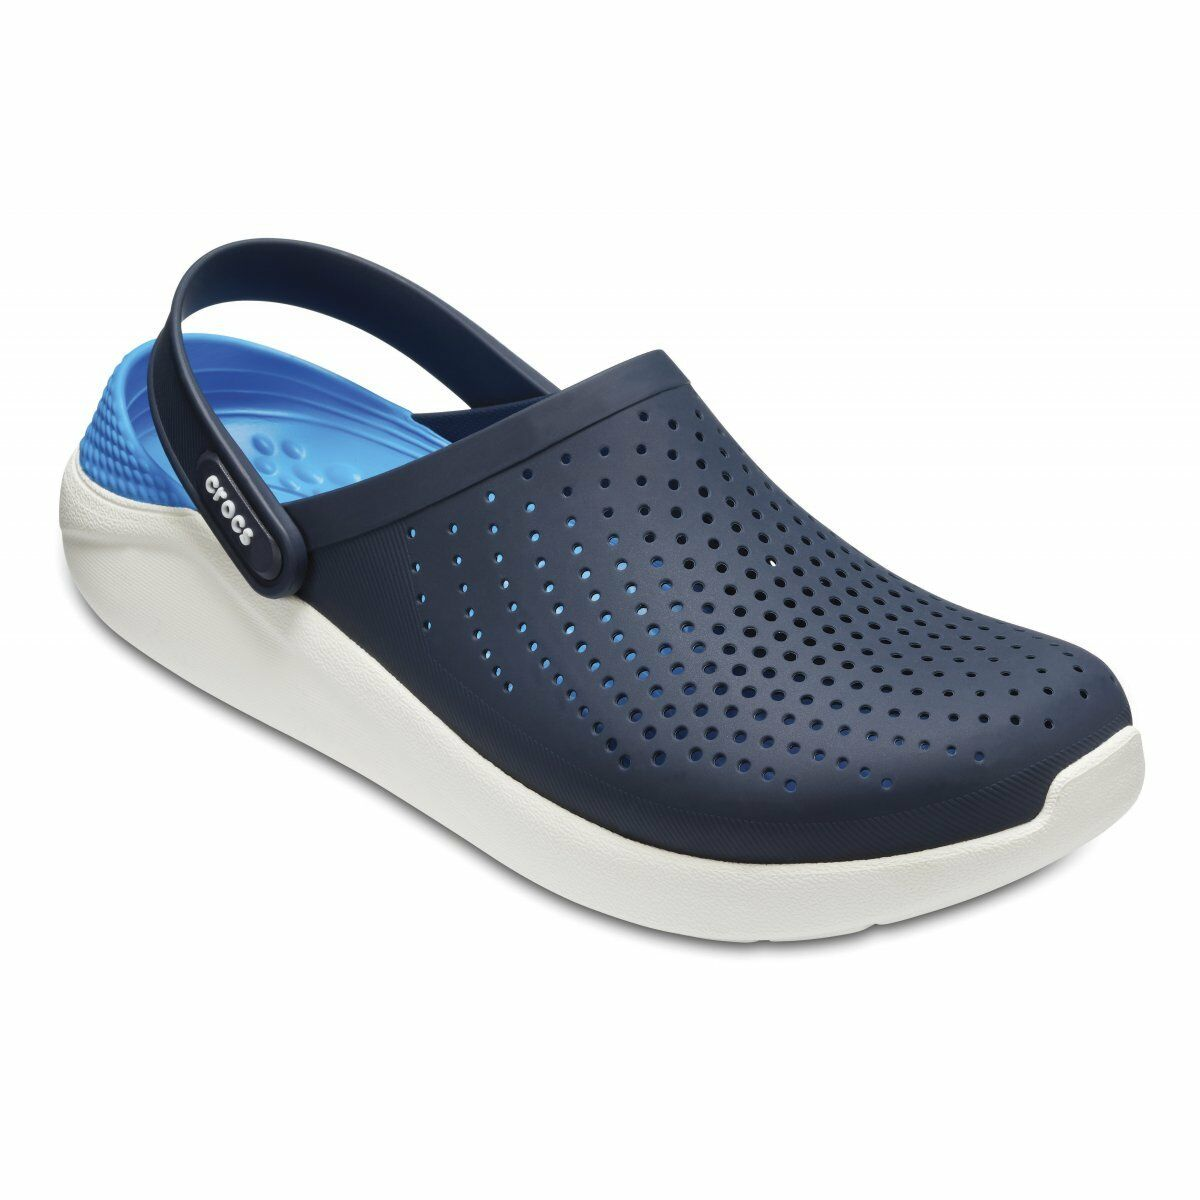 Zueco Crocs Lite Ride Relaxed Fit Zapatos Sandalias Azul Marino blancoo 204592-462 literide